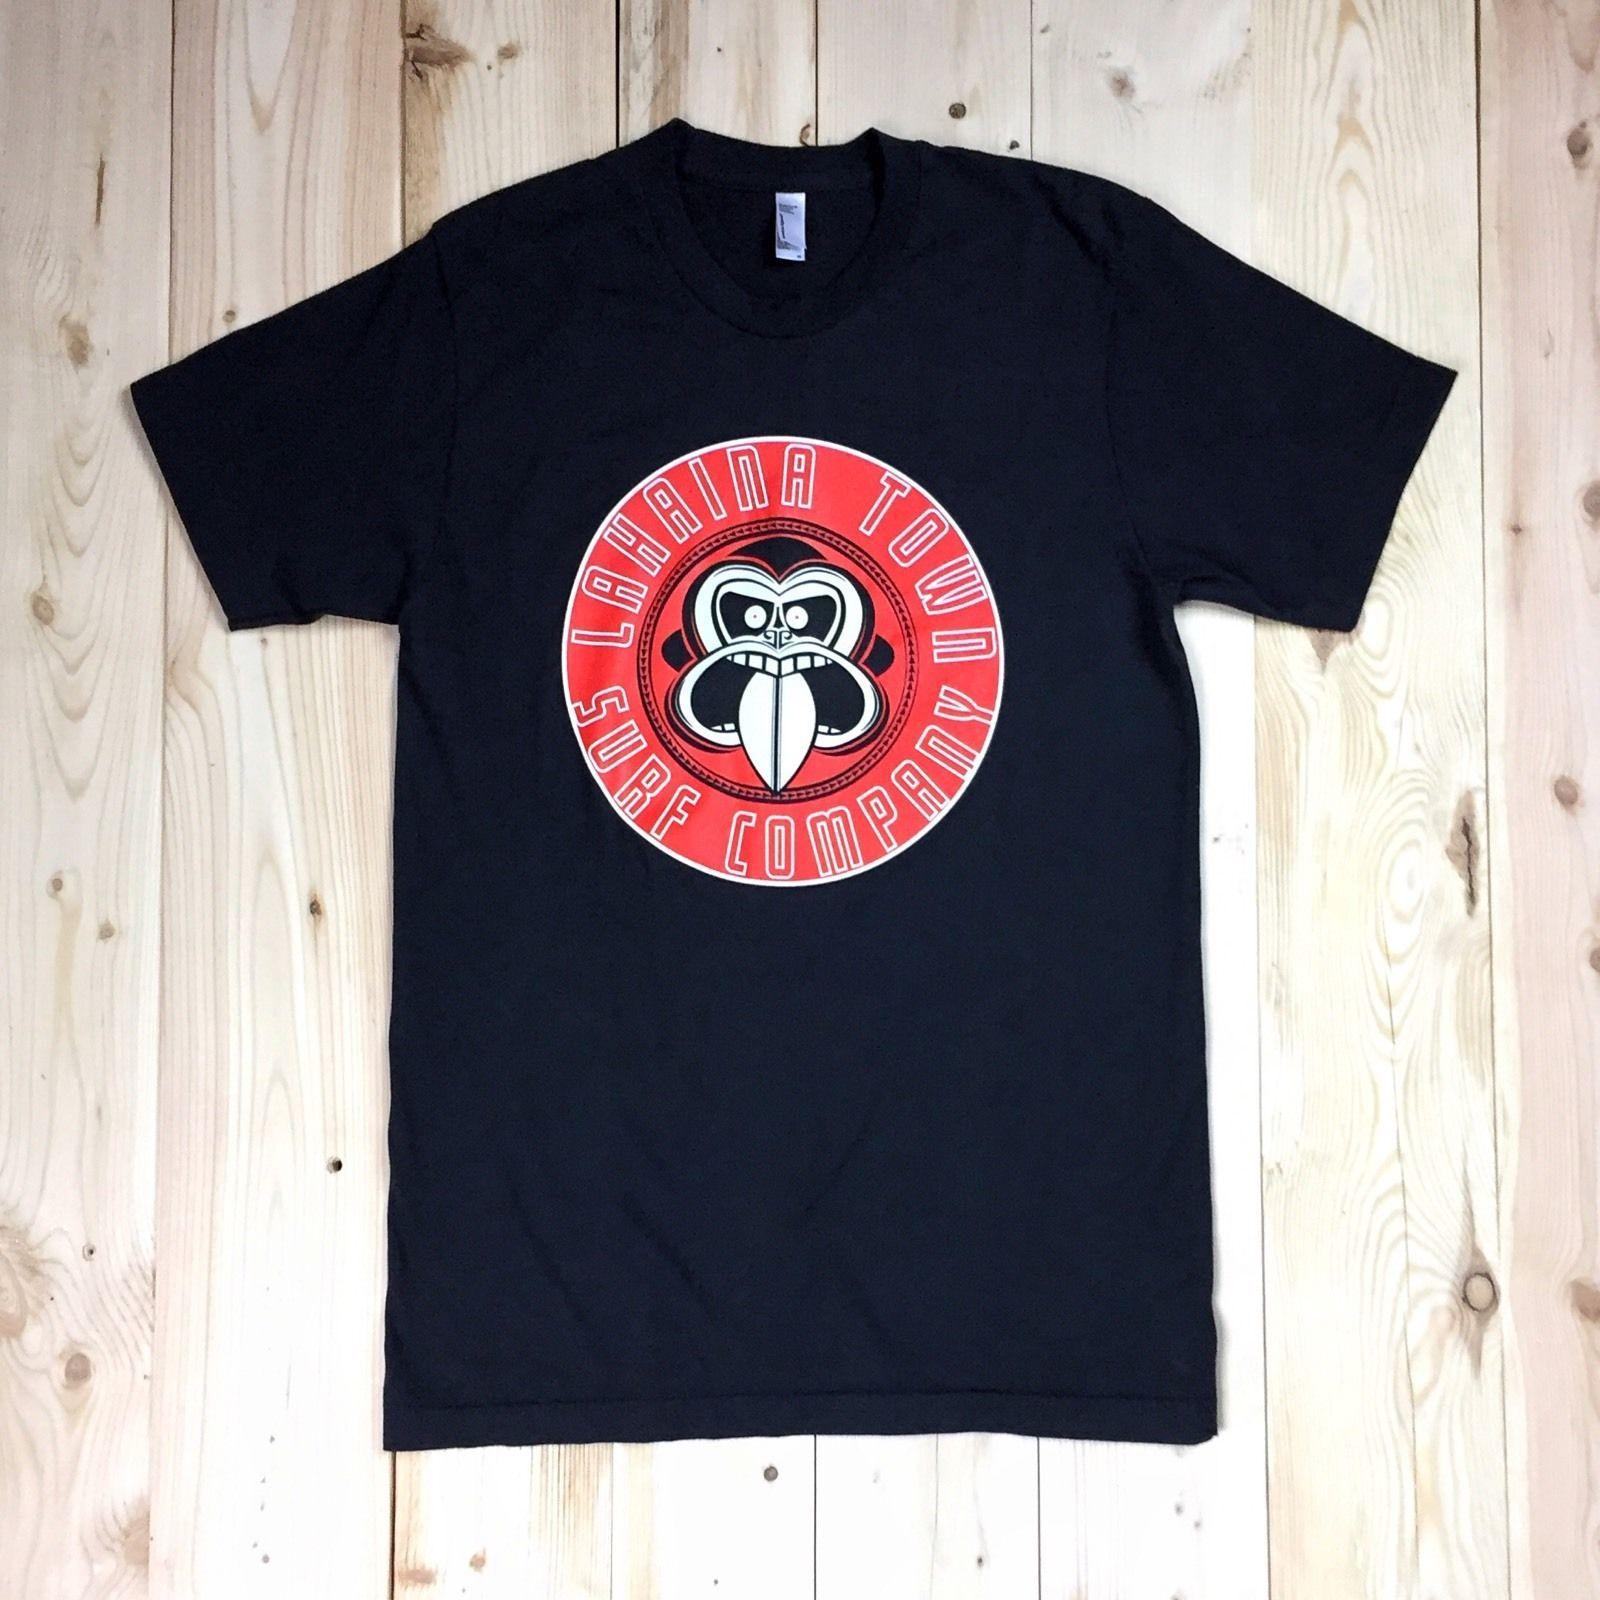 lahaina town surf company men s t shirt medium black slim fit new